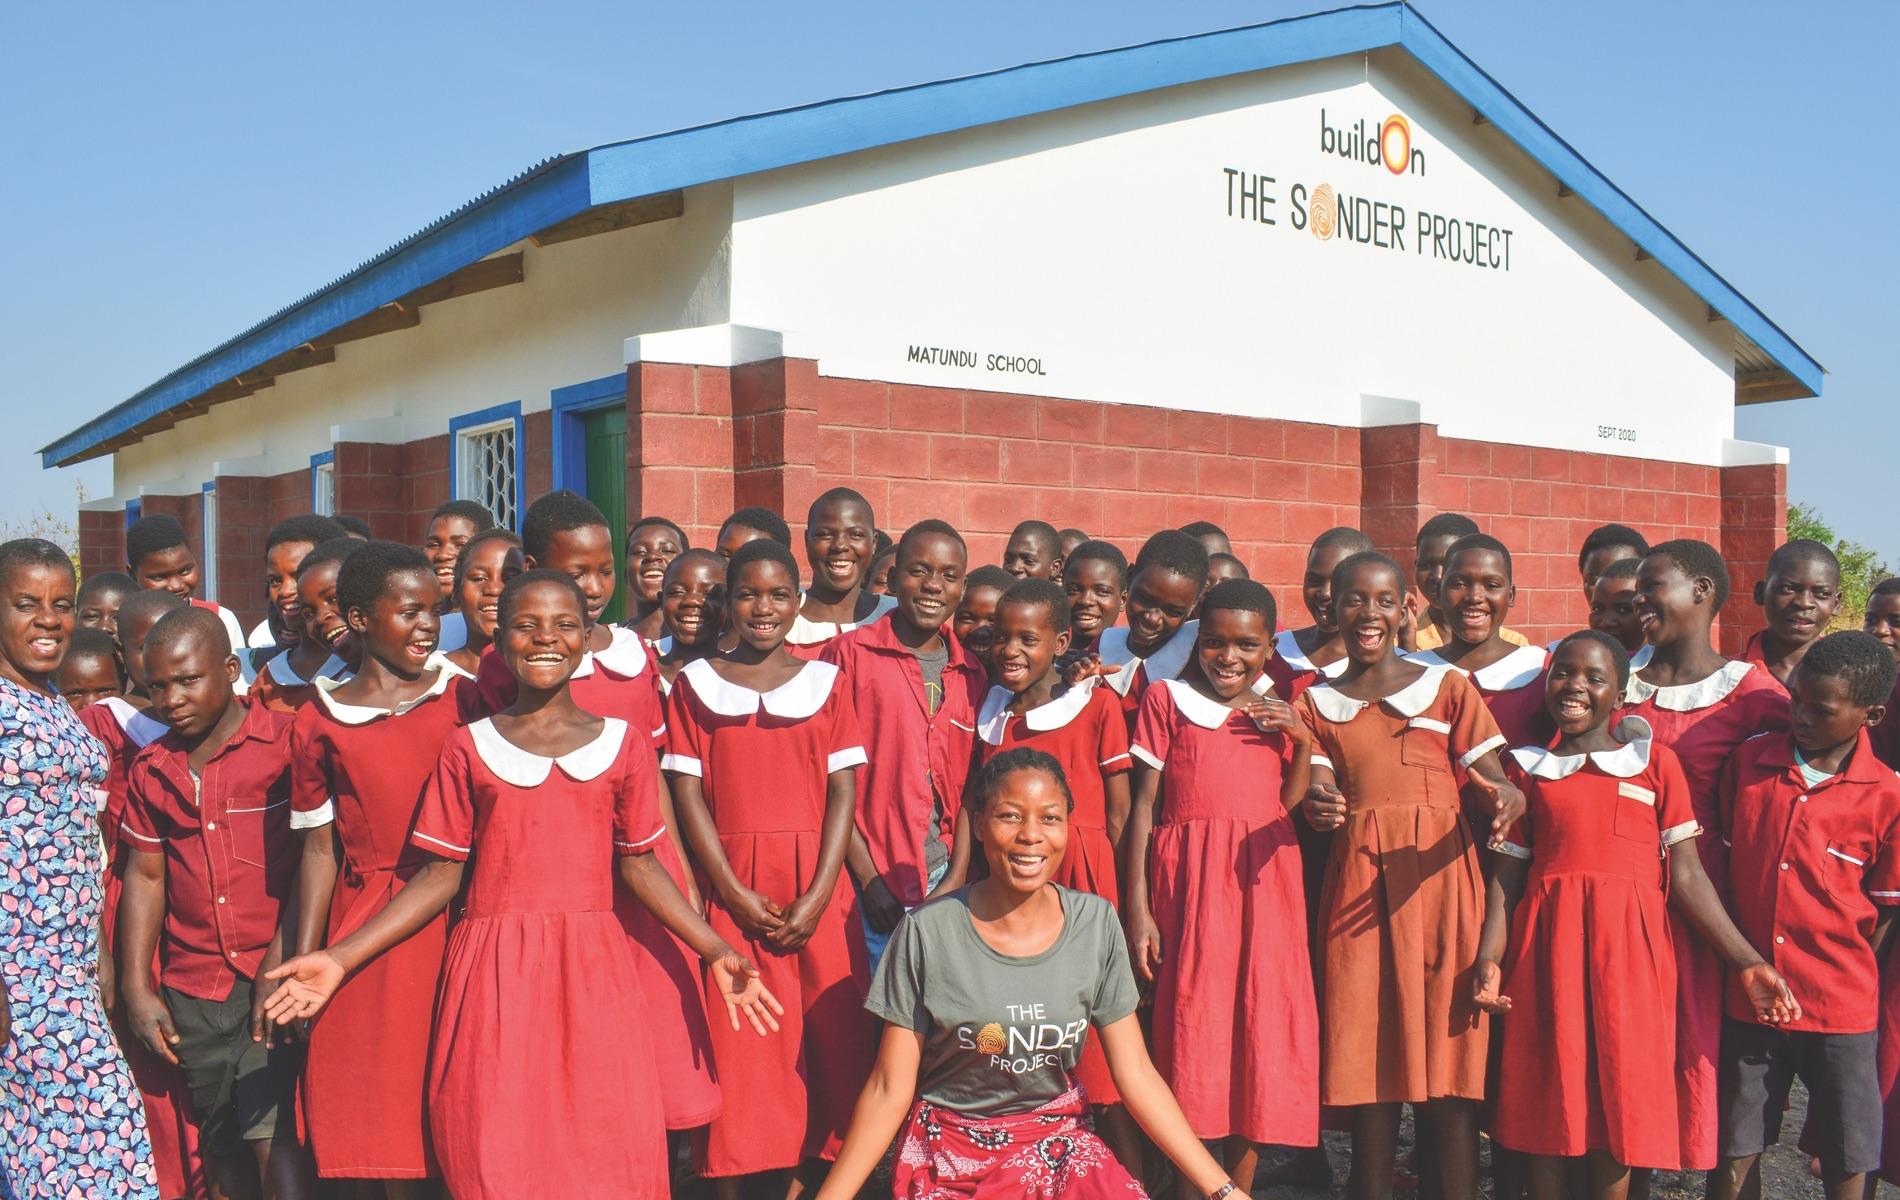 The Sonder Project, Build On, Malawi, Burkina Faso, Matundu School